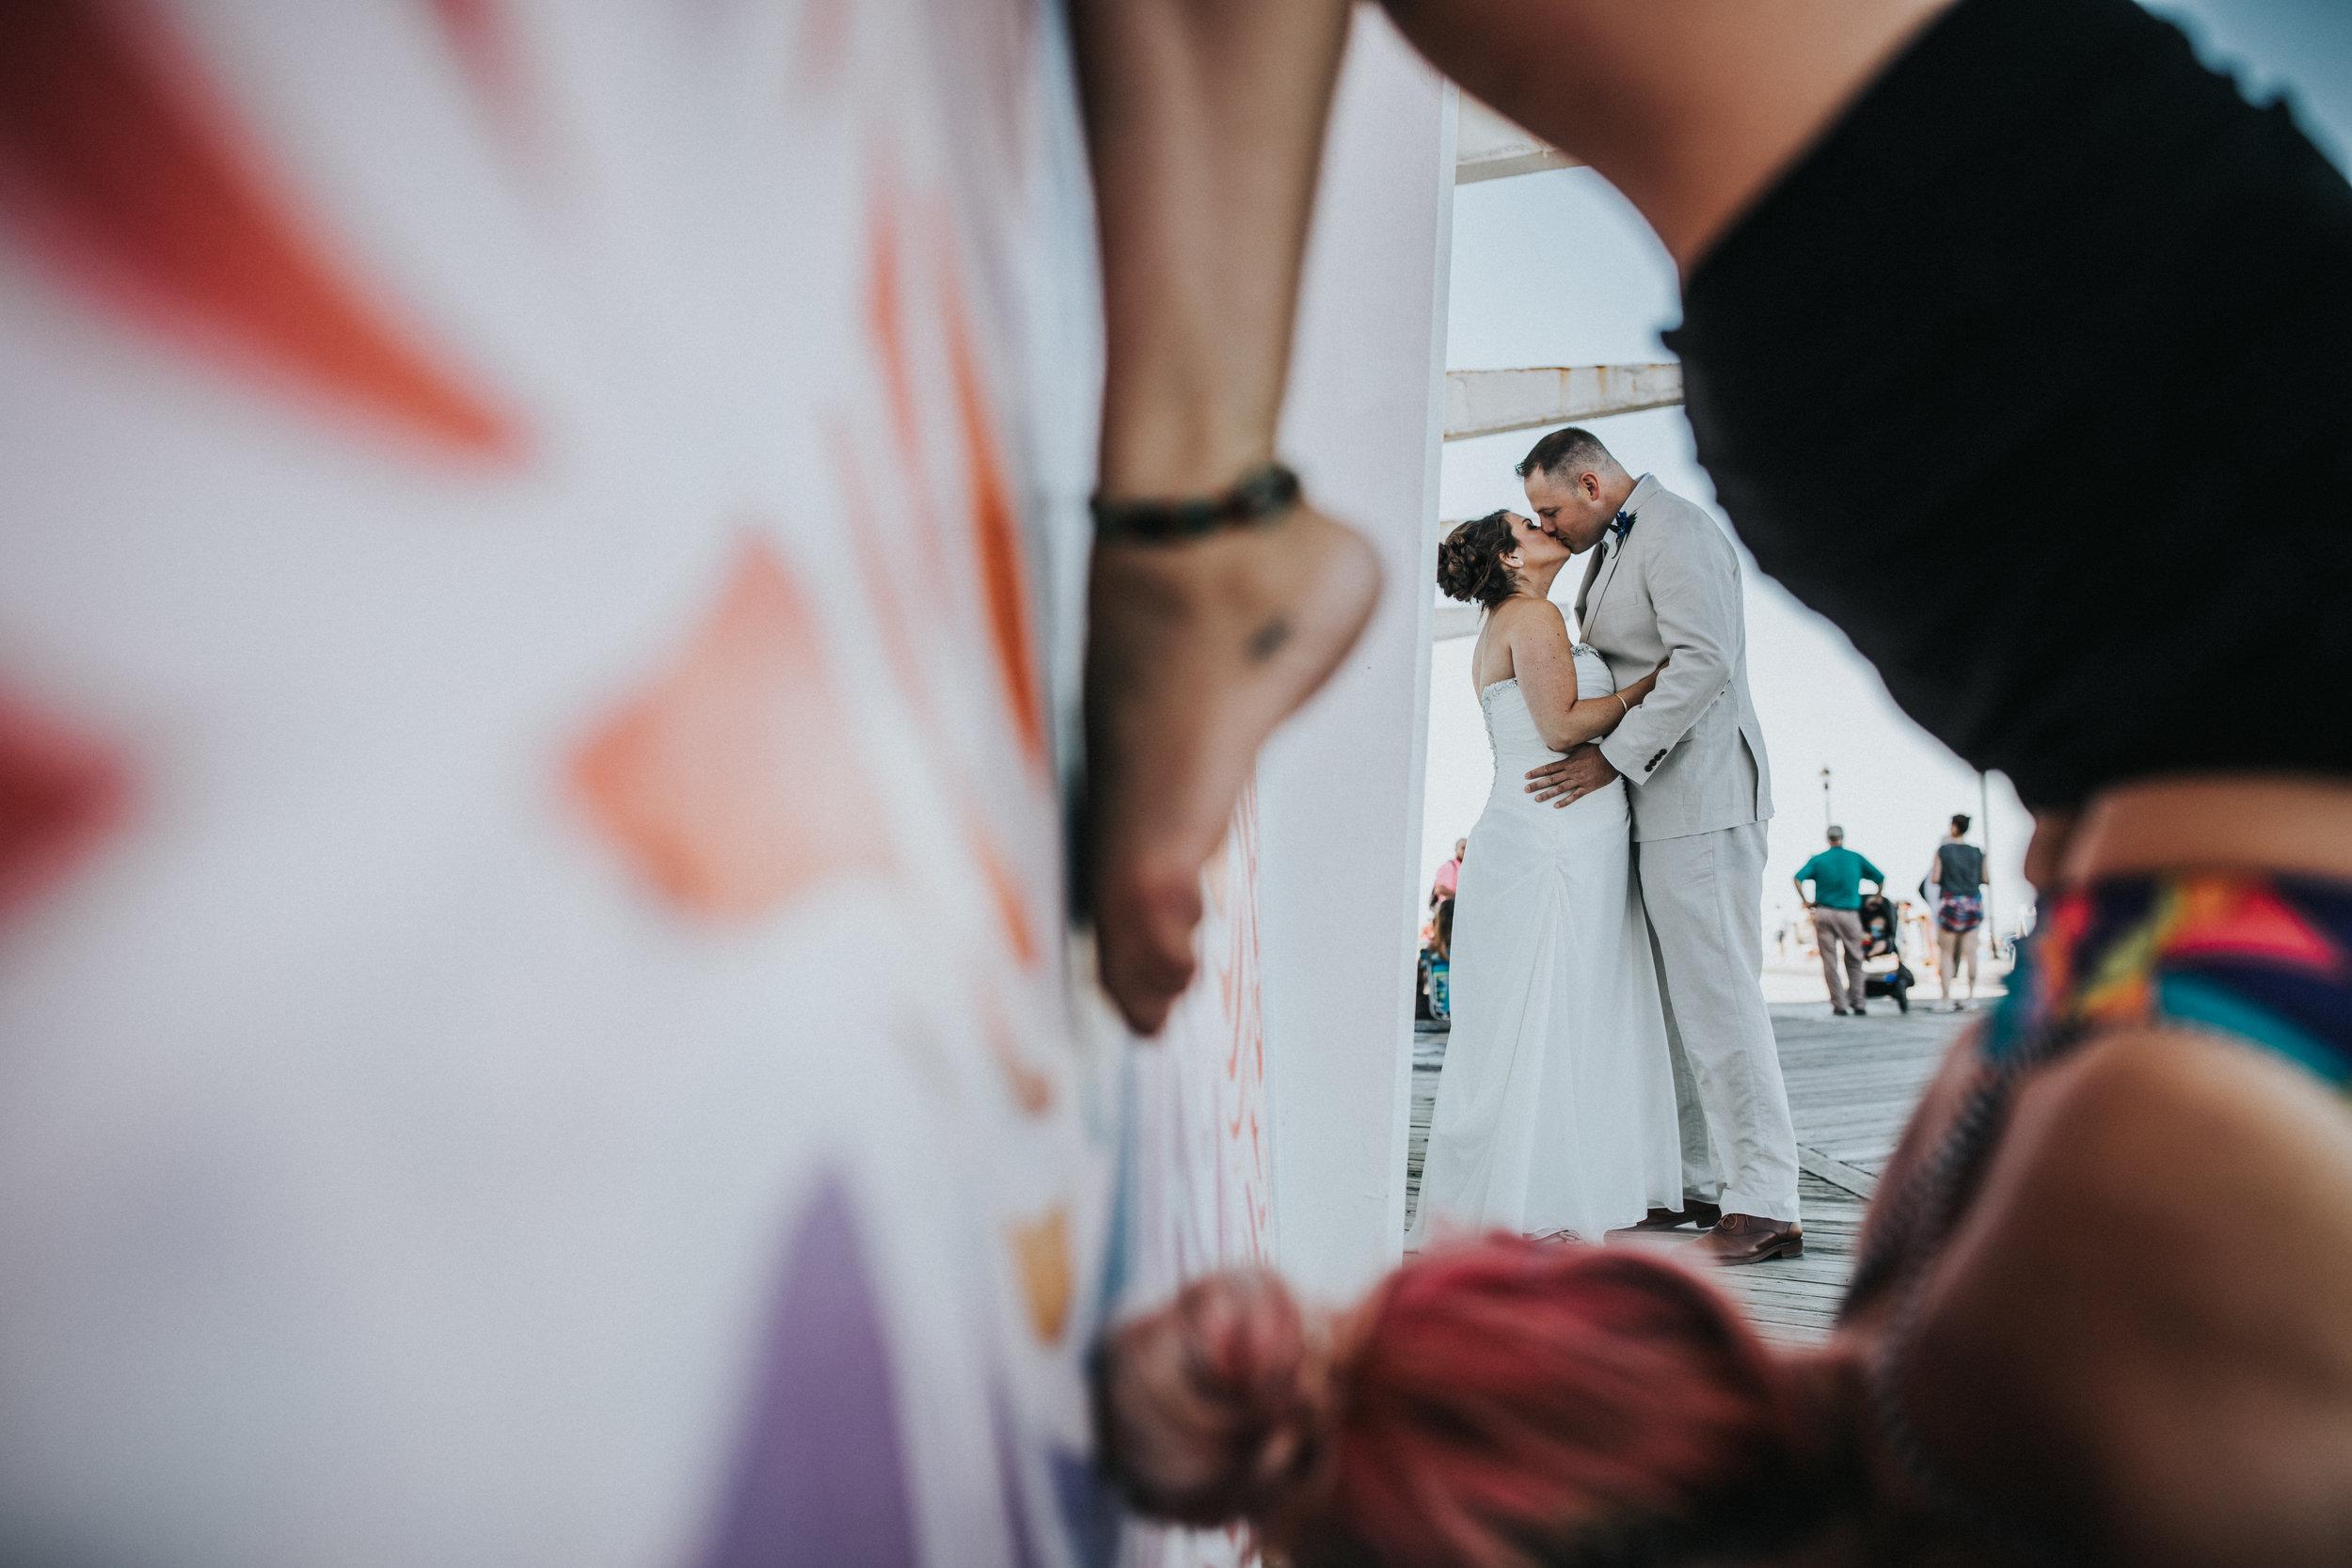 JennaLynnPhotography-NJWeddingPhotographer-Wedding-TheBerkeley-AsburyPark-Allison&Michael-Bride&Groom-31.jpg